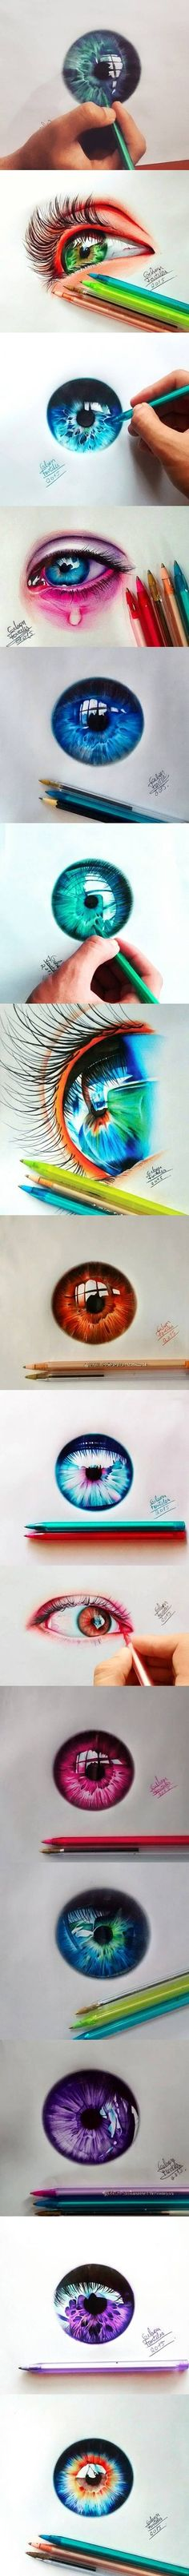 Fascinating Eyes Colors Drawing by Artist Gelson Fonteles Colorful Drawings, Cool Drawings, Realistic Drawings, Pencil Art, Pencil Drawings, Arte Sketchbook, Eye Art, Art Techniques, Art Tutorials